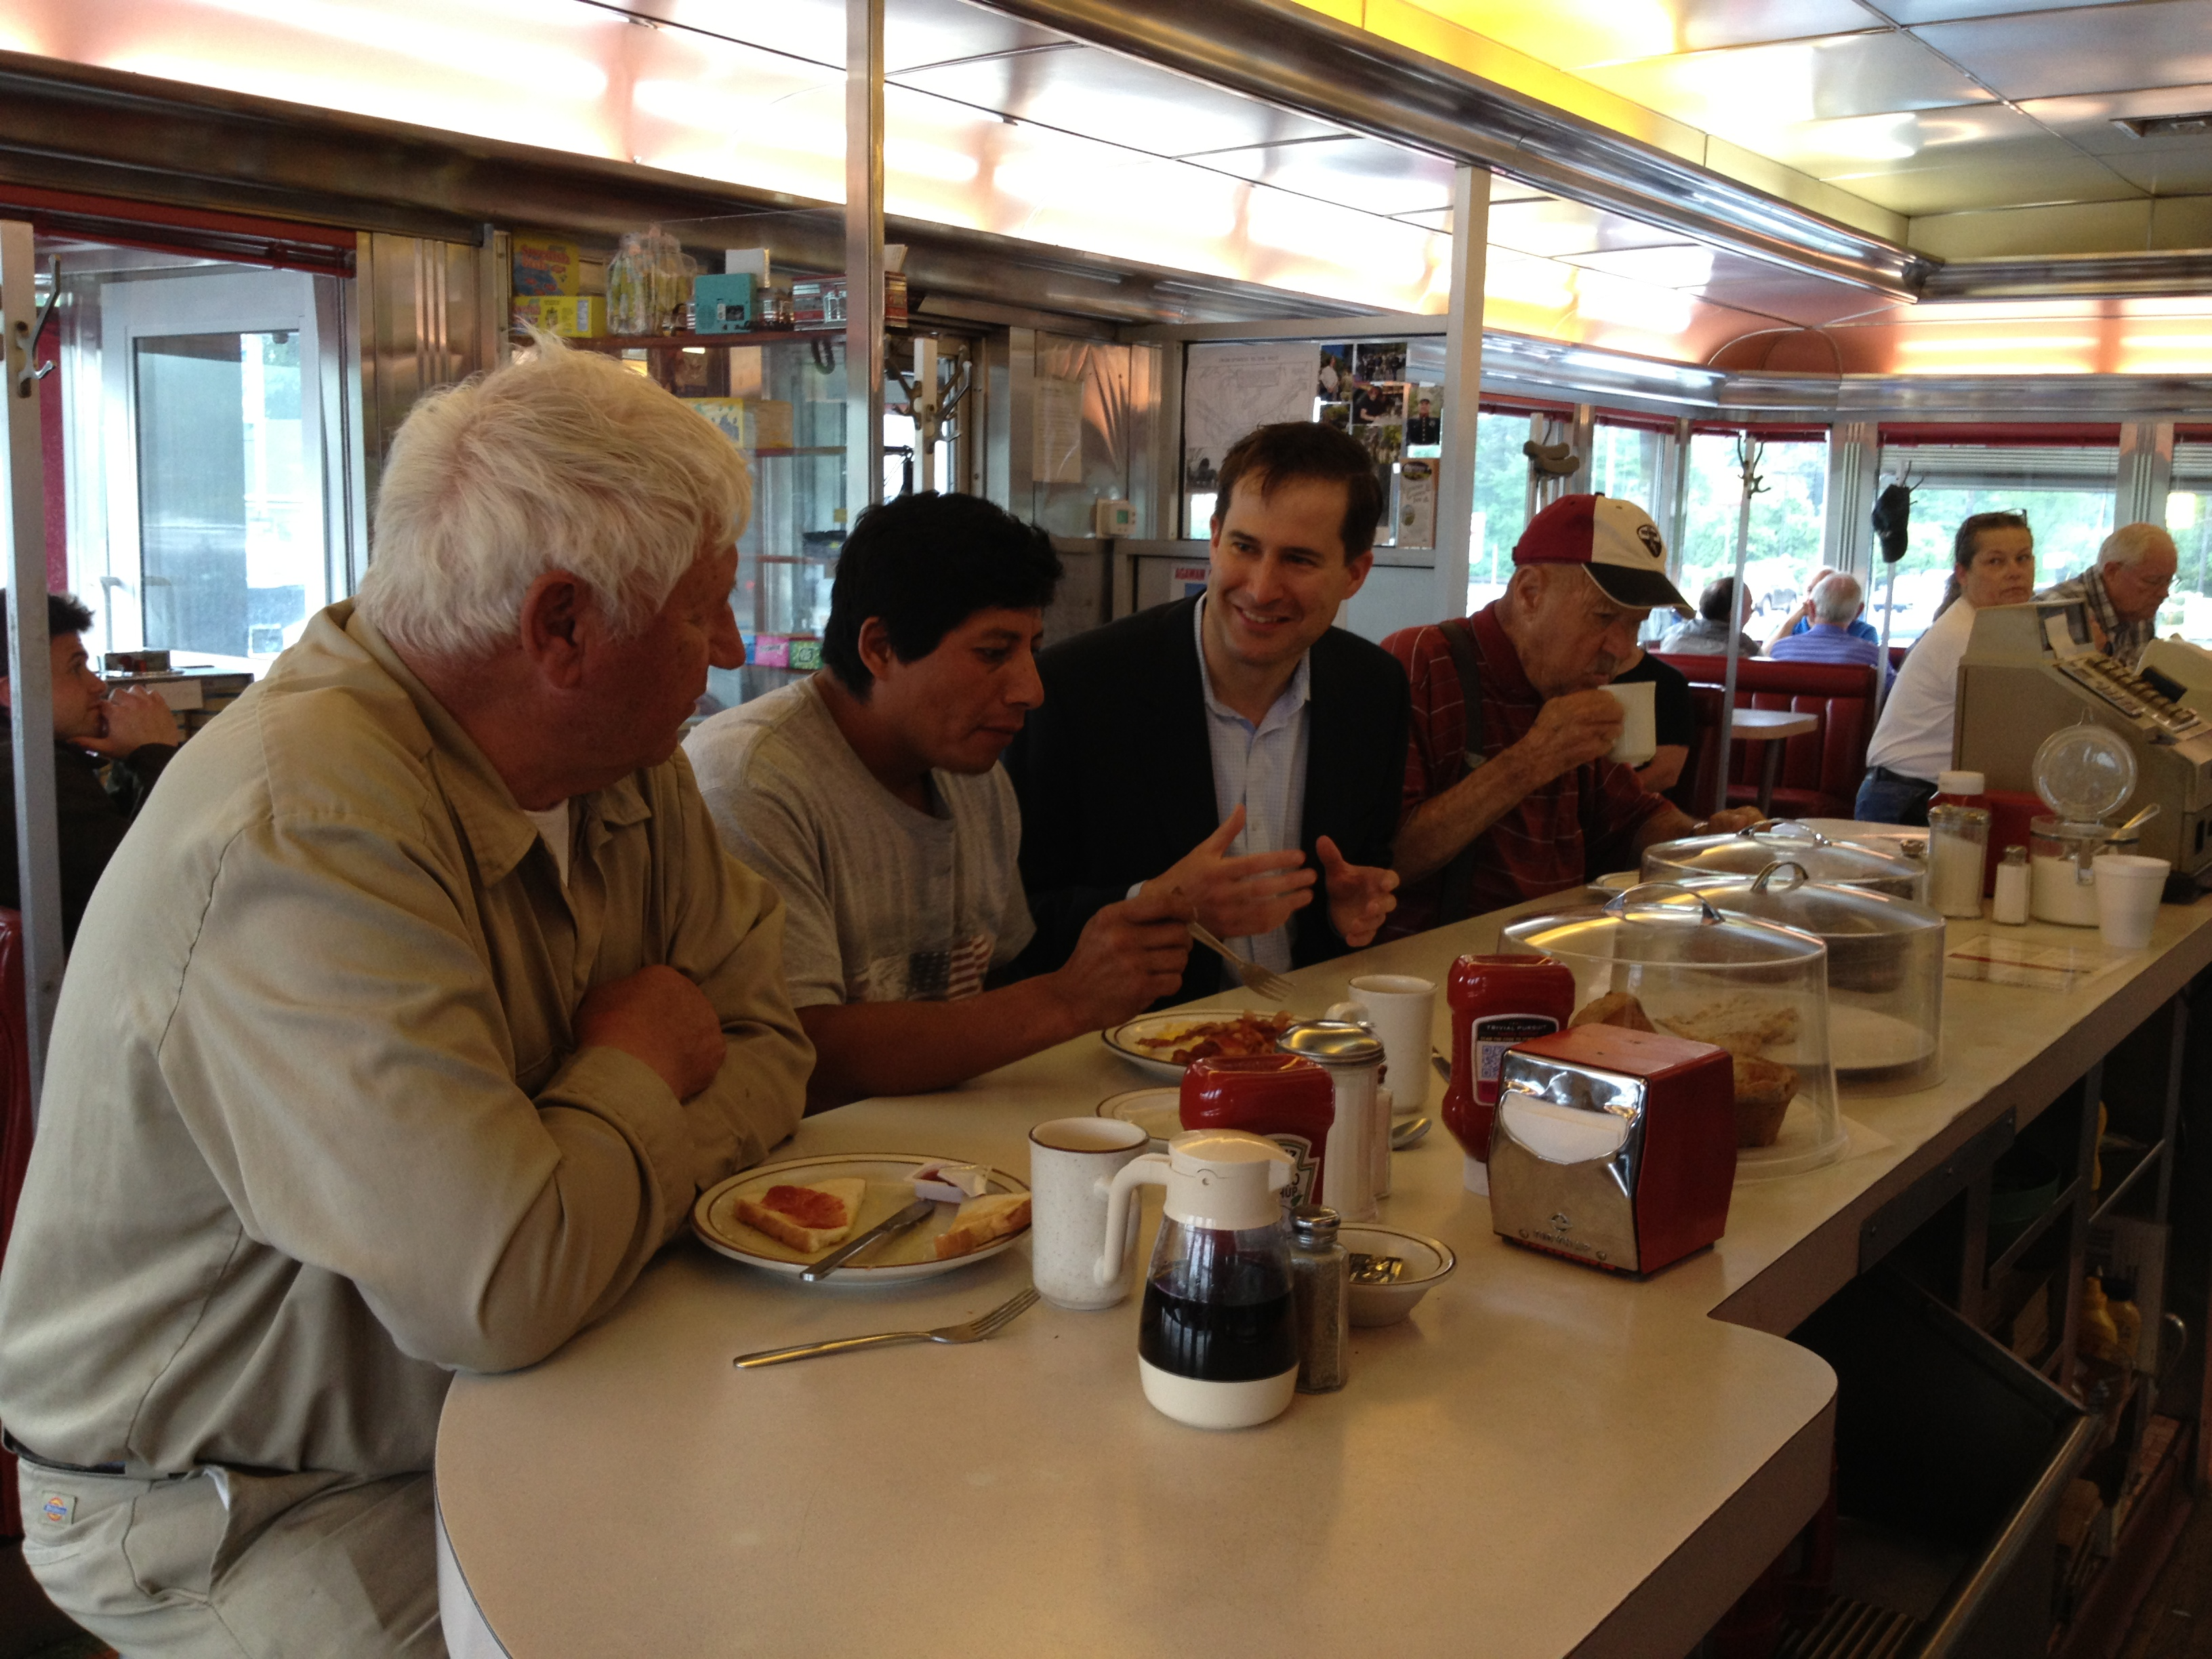 140610_Fresh_Start_Breakfast_at_Agawam_Diner_in_Rowley.jpg